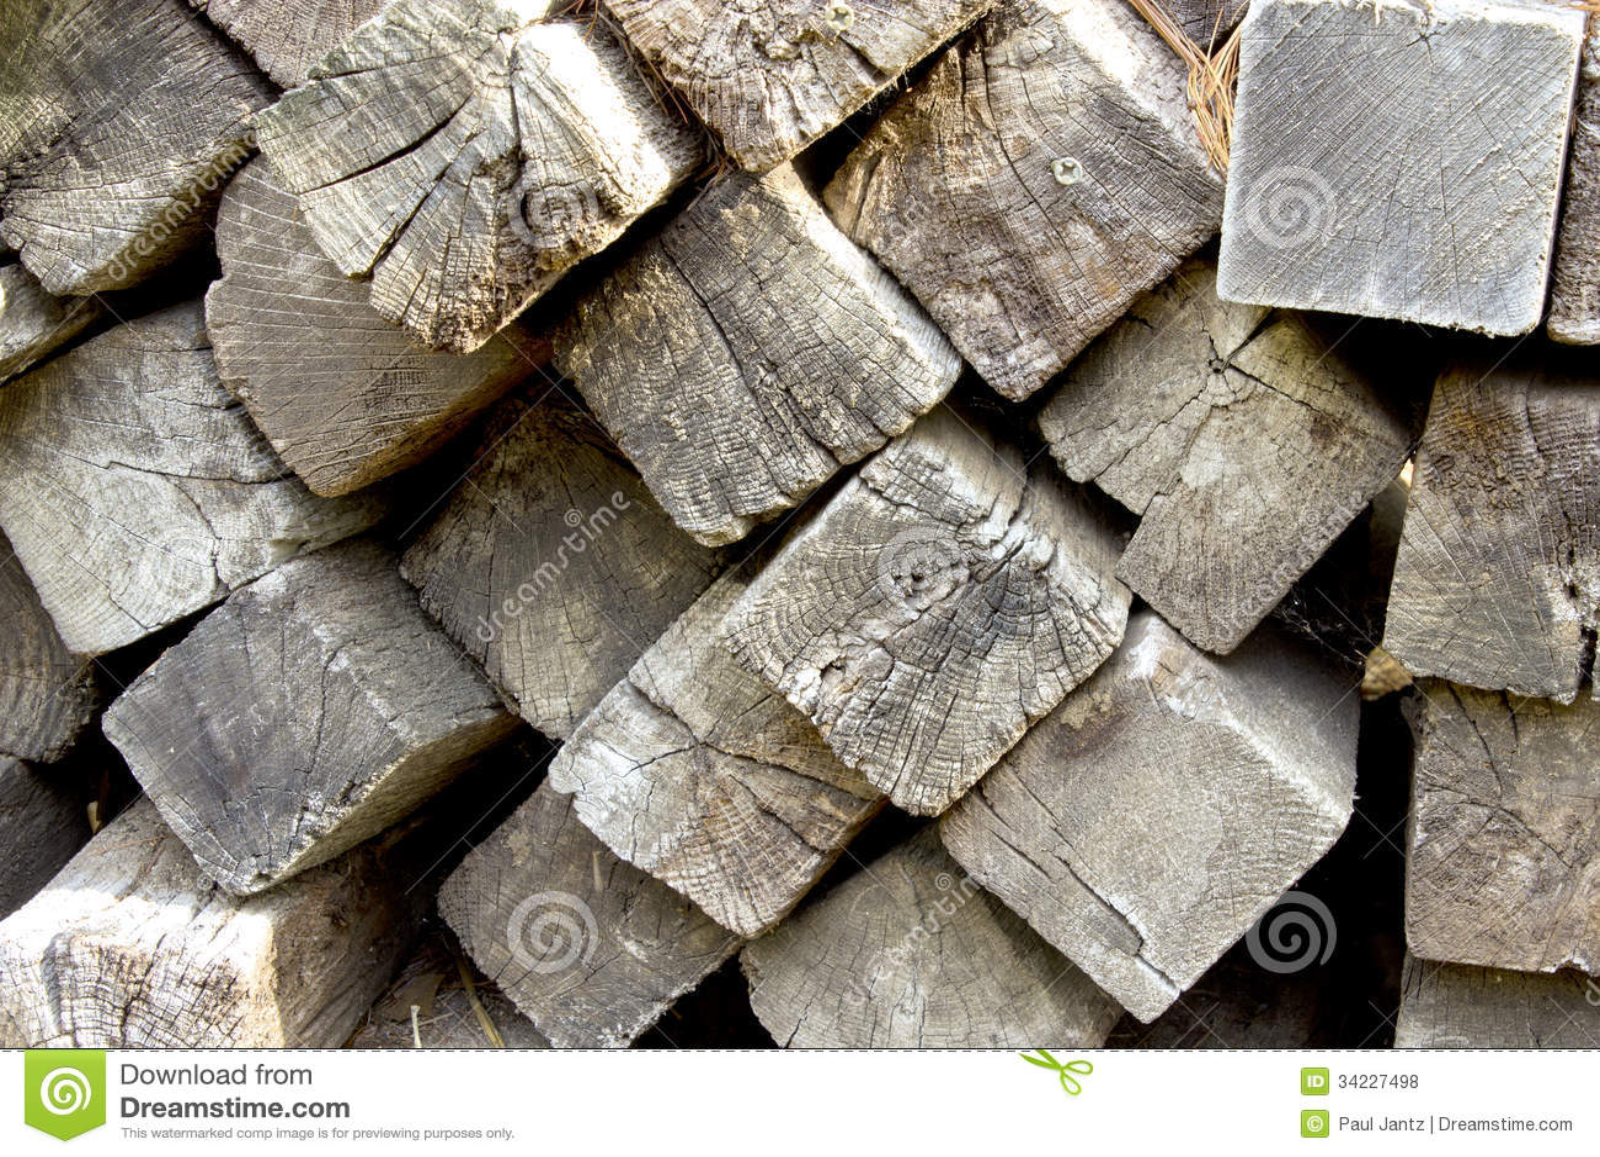 Railroad ties stock photo  Image of rough, seasoned, timbers - 34227498